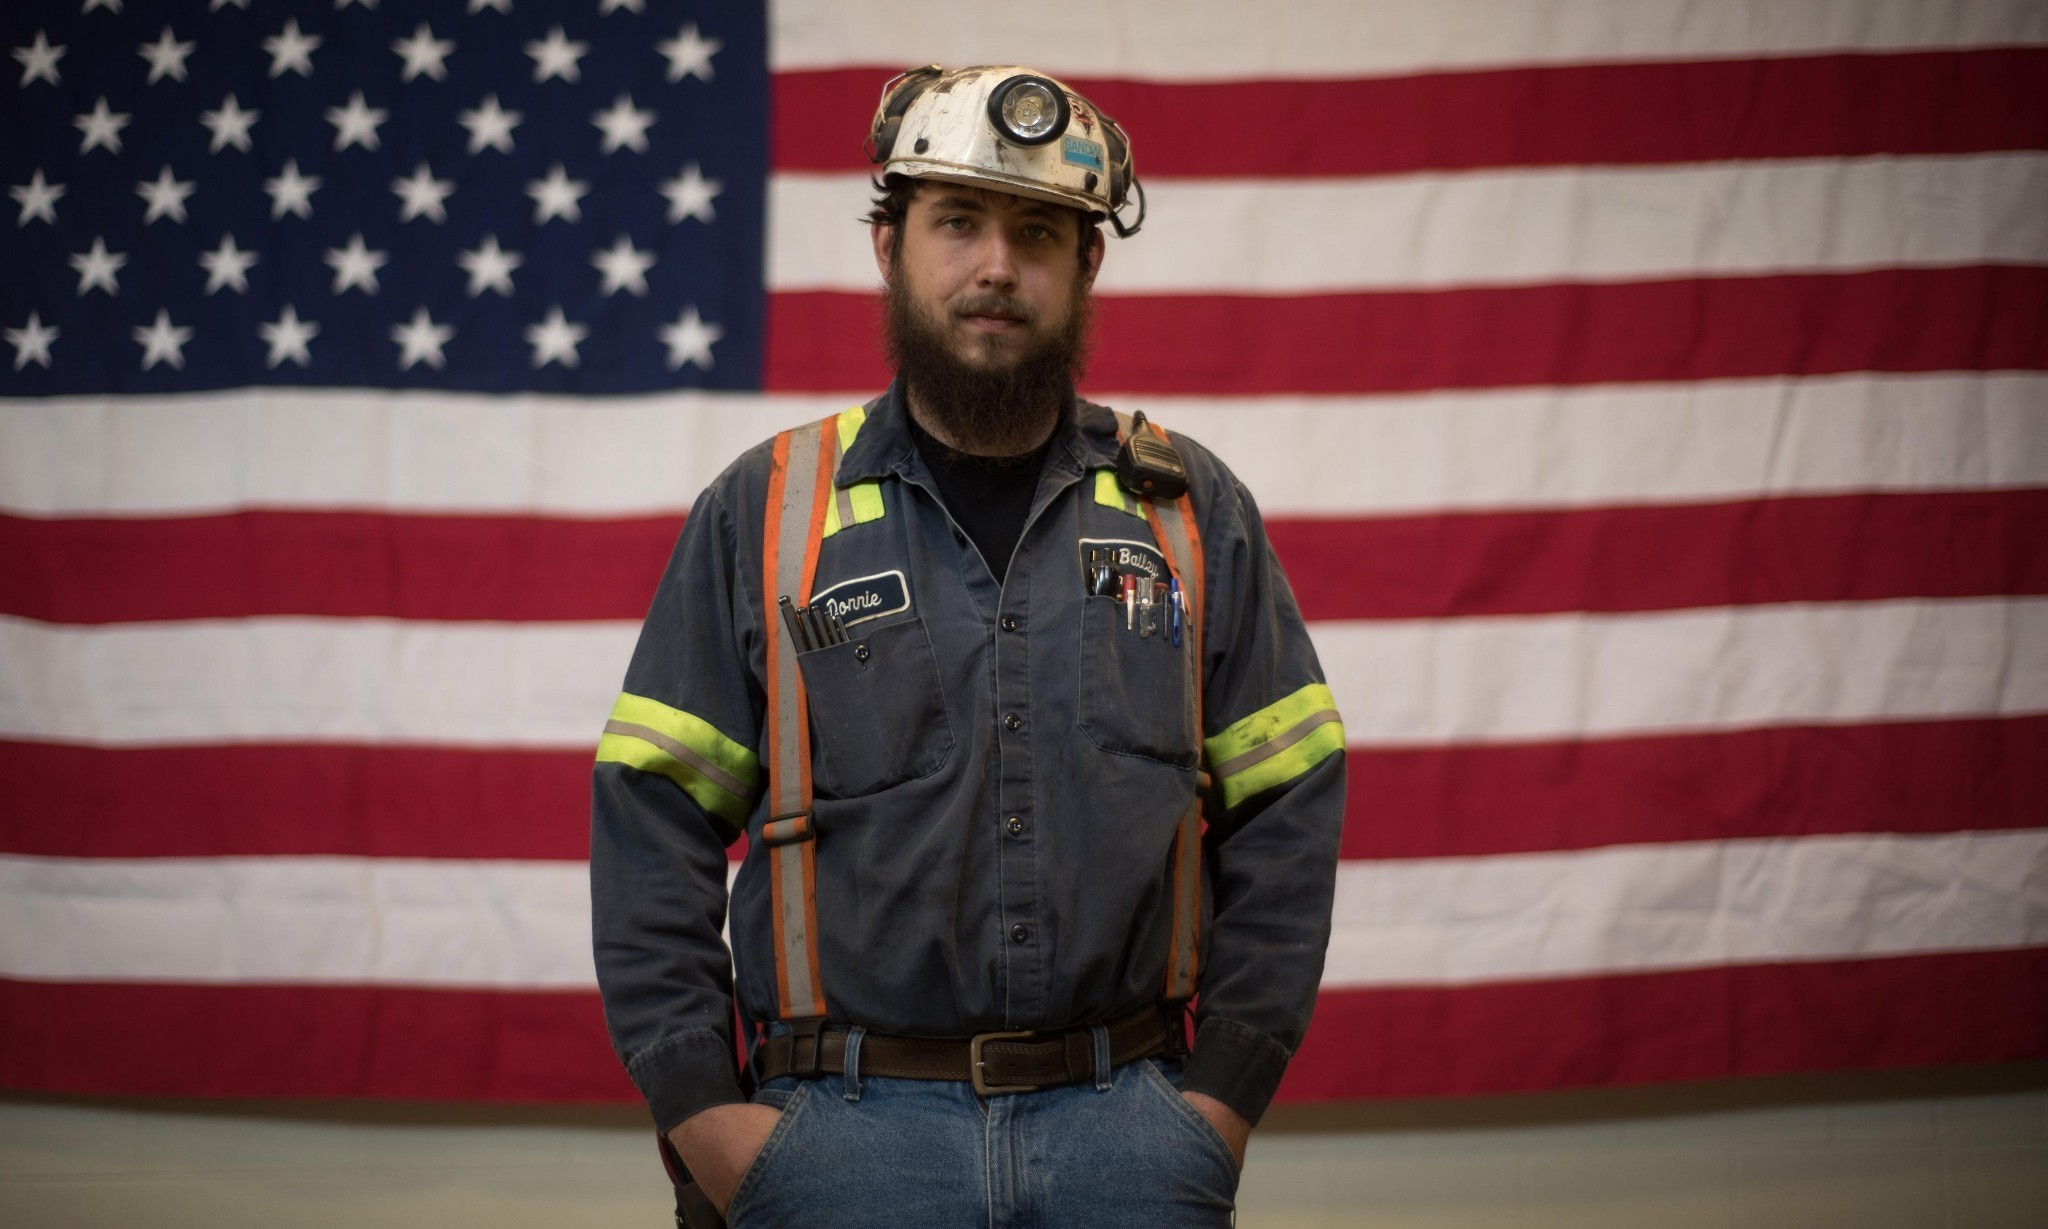 Scott Pruitt hails era of environmental deregulation in speech at coal mine